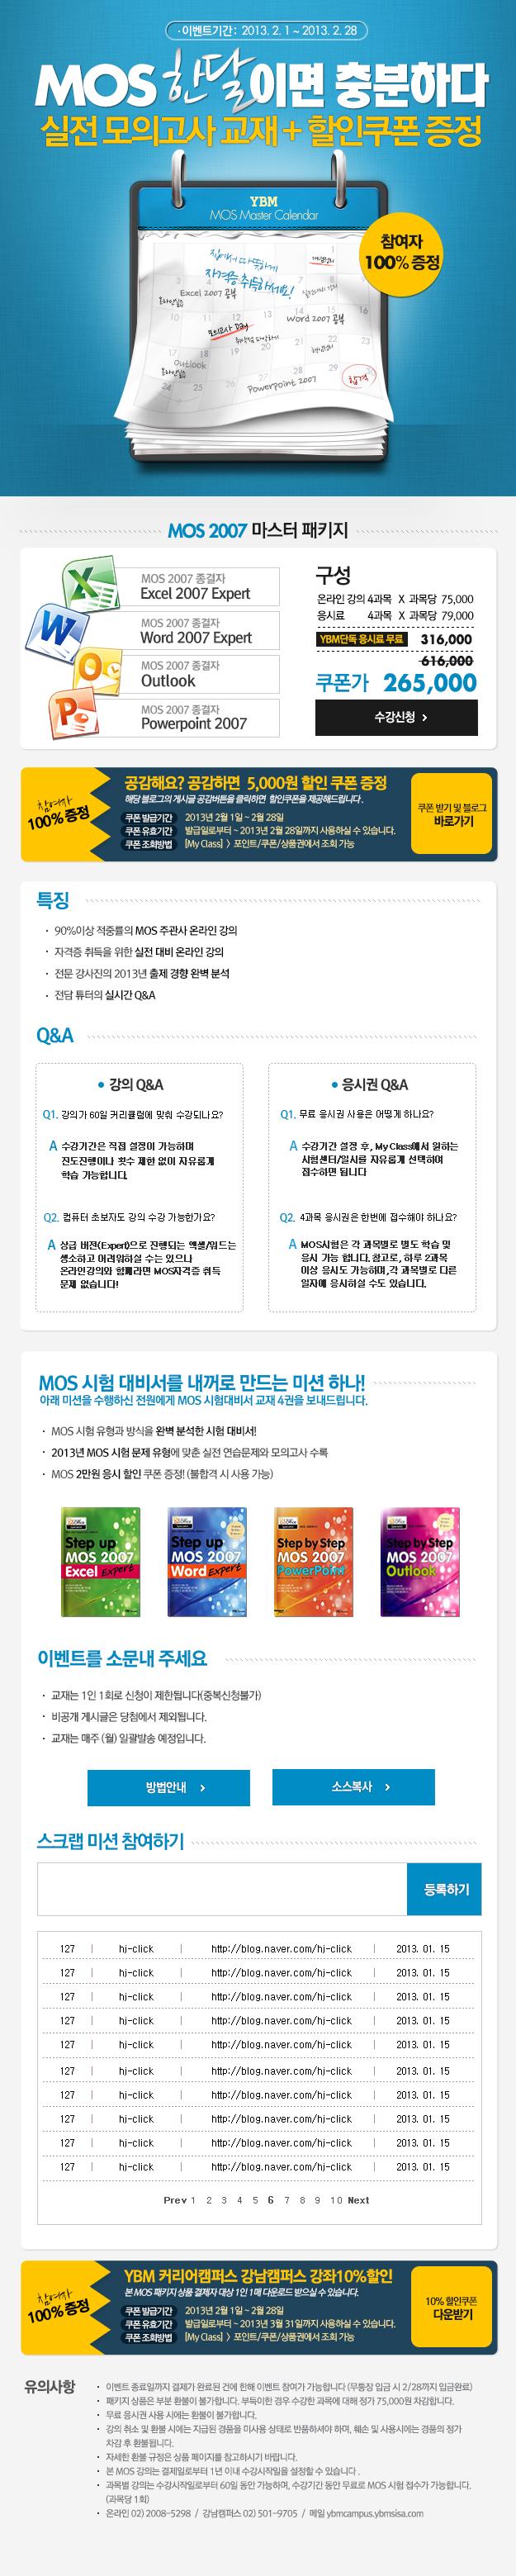 [HRD] mos2월프로모션 (김보인)